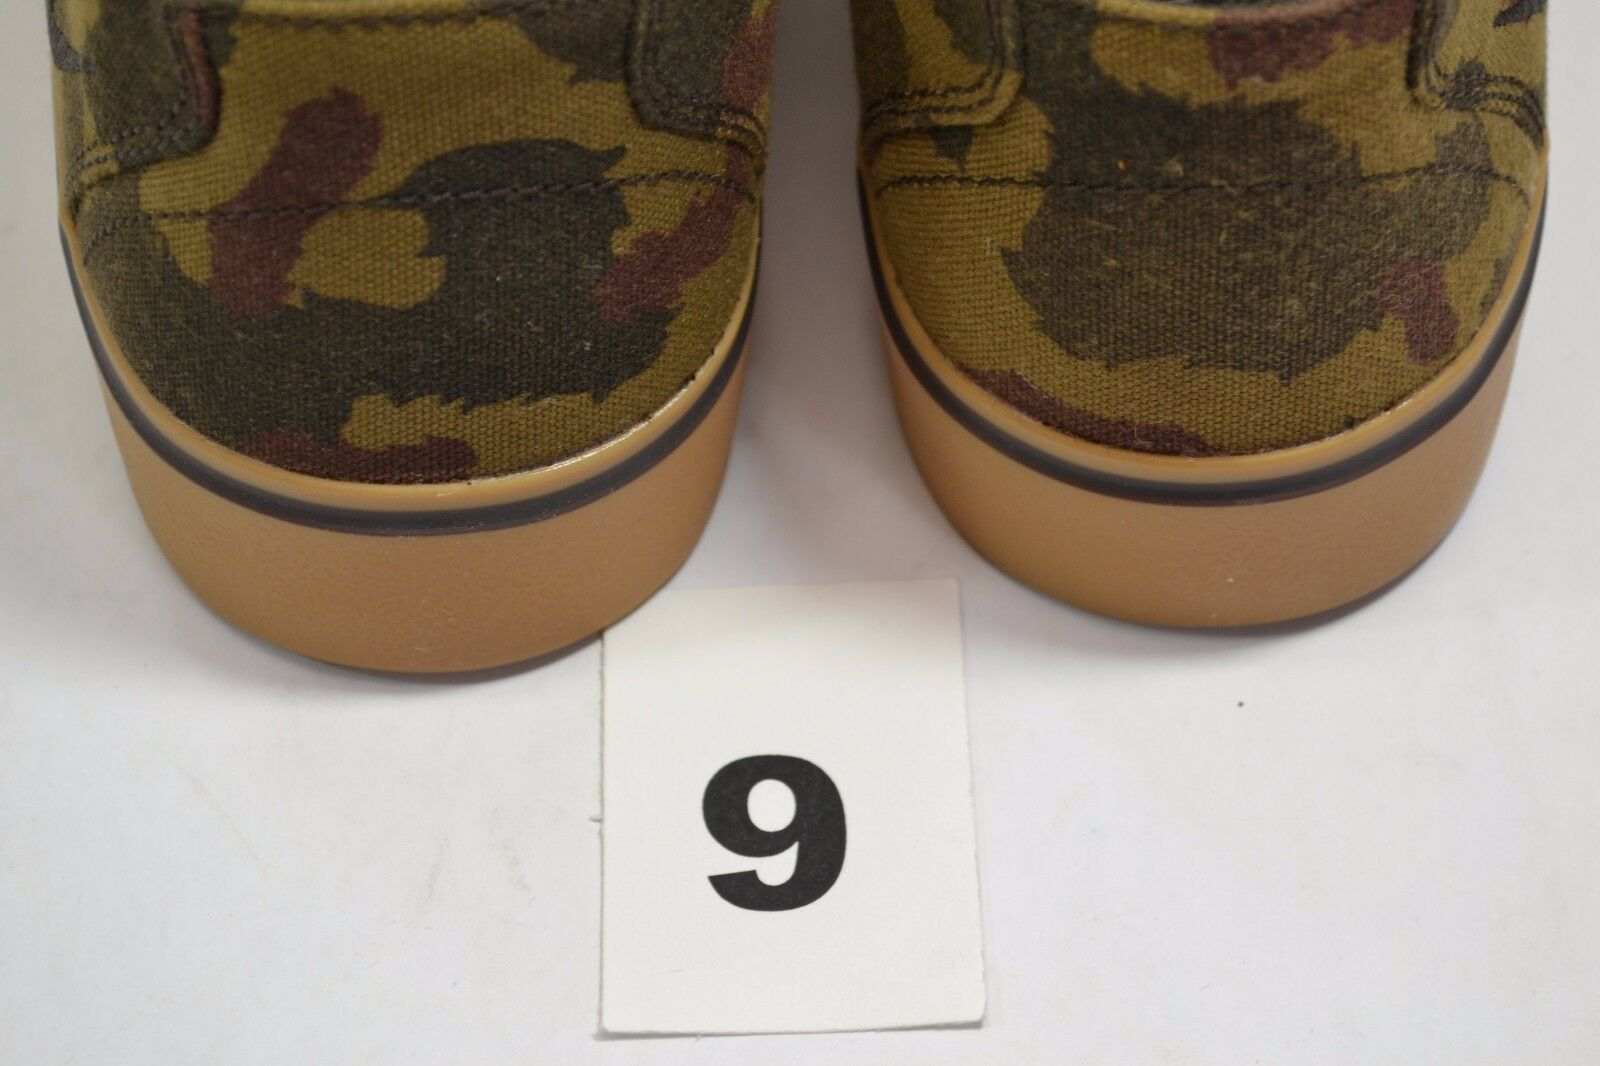 4dcf69f2bf2d ... Nike BRAATA LR POLER Velvet Brown Brown Brown Military Brown Discounted  (315) Men s Shoes ...